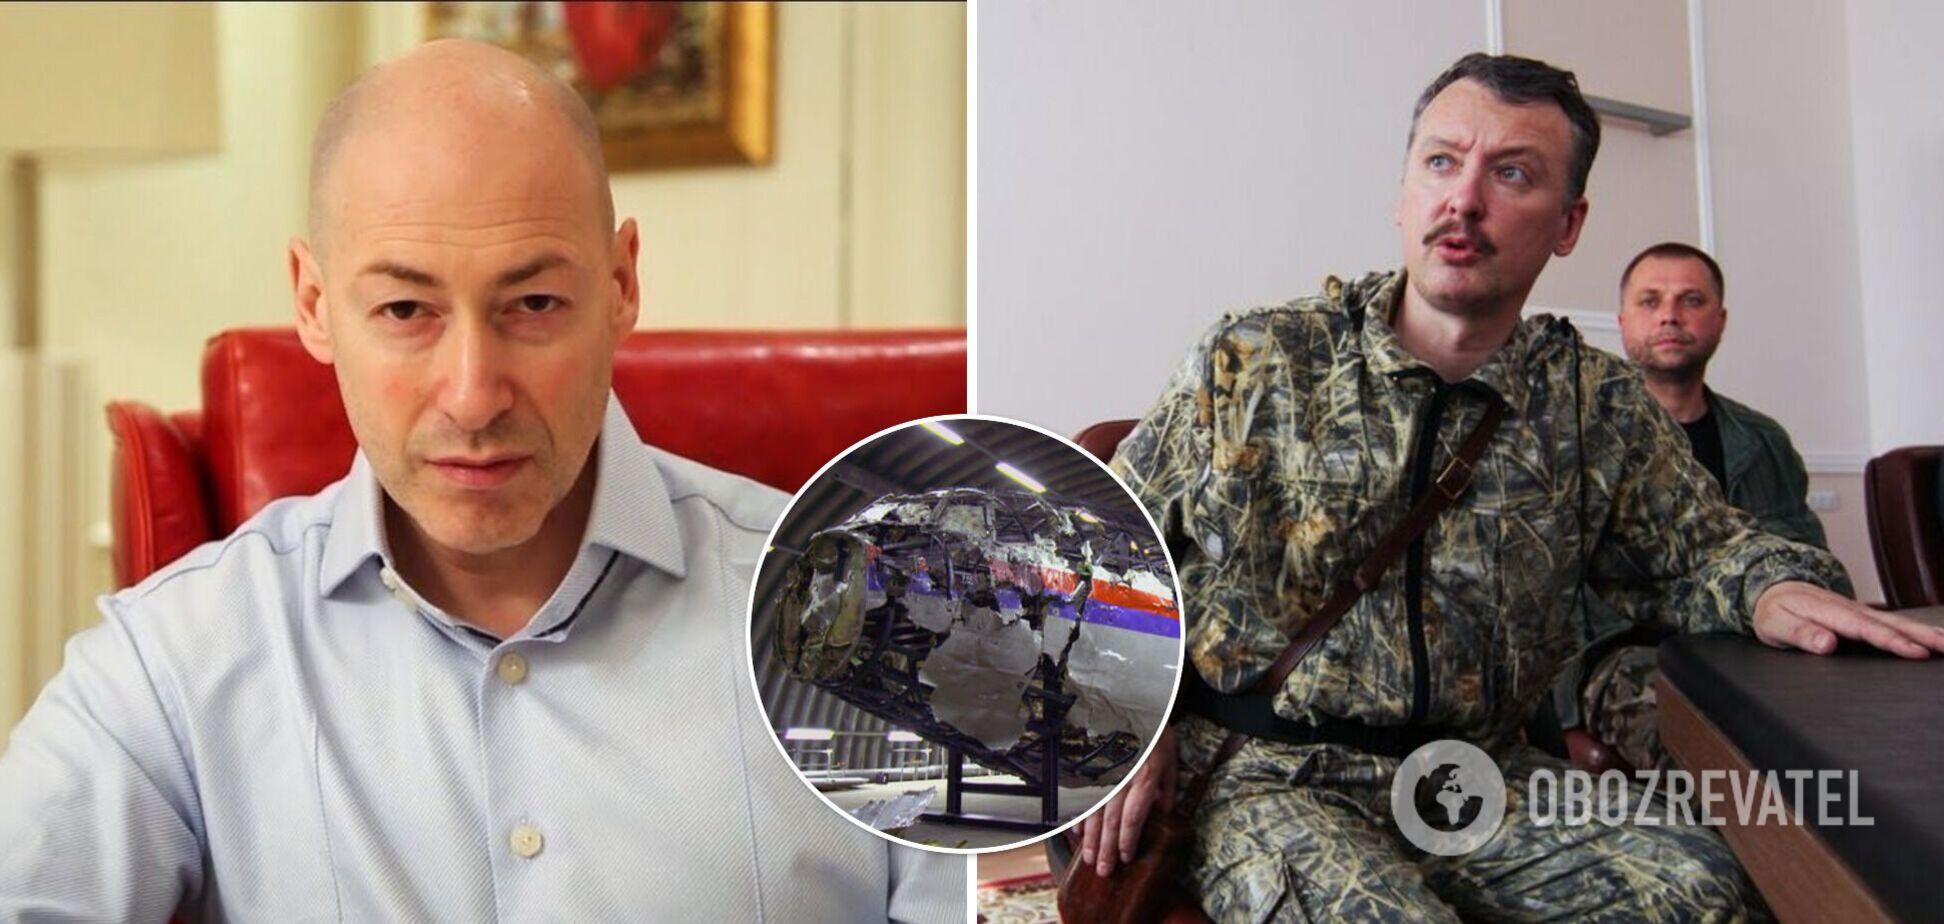 В Гааге приобщили 'флешку Гордона' к делу MH17